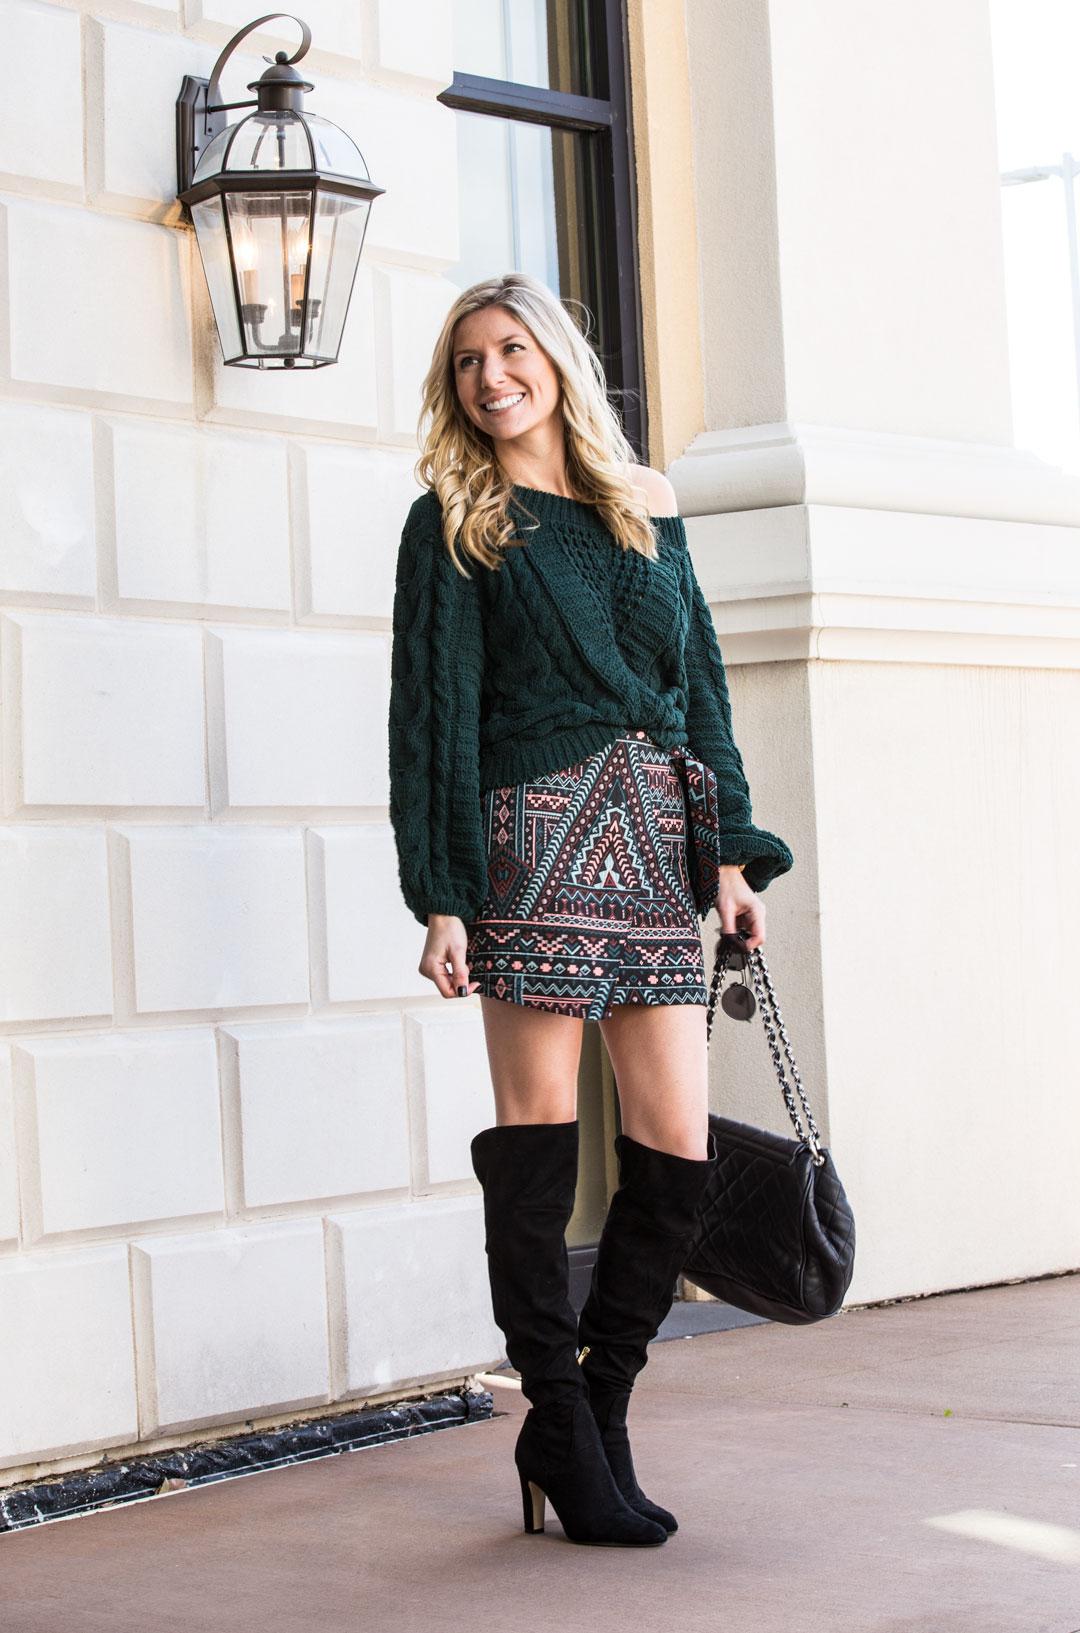 Express Jacquard Skirt and Cableknit Sweater